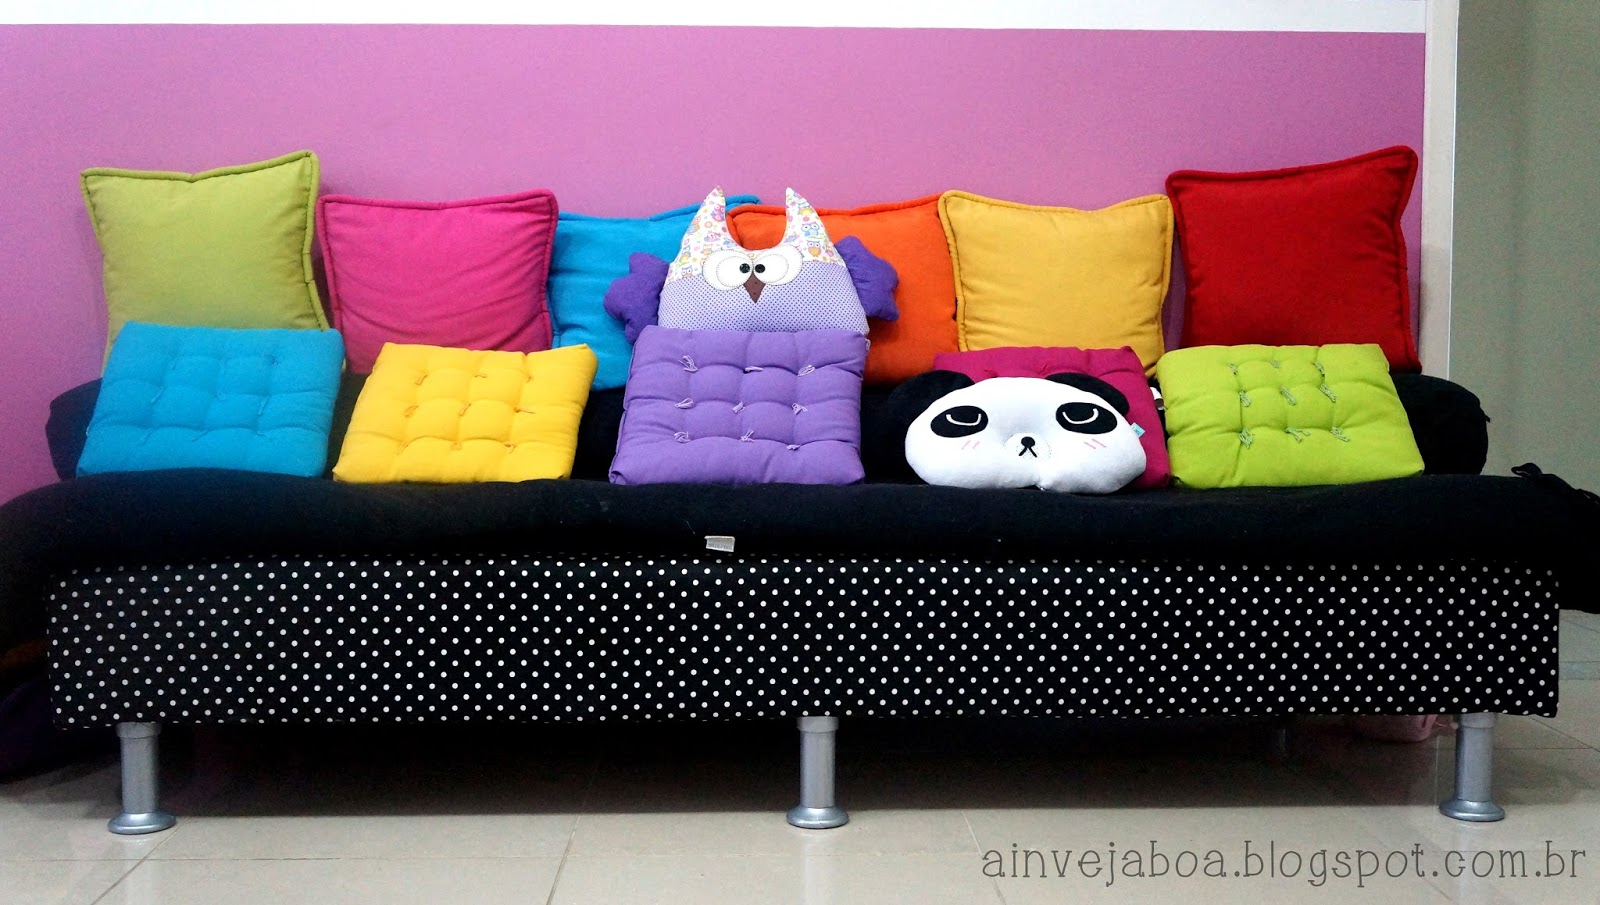 sofa e colchao osasco well full leather beige set ottoman inveja boa diy transforme qualquer ambiente de forma simples